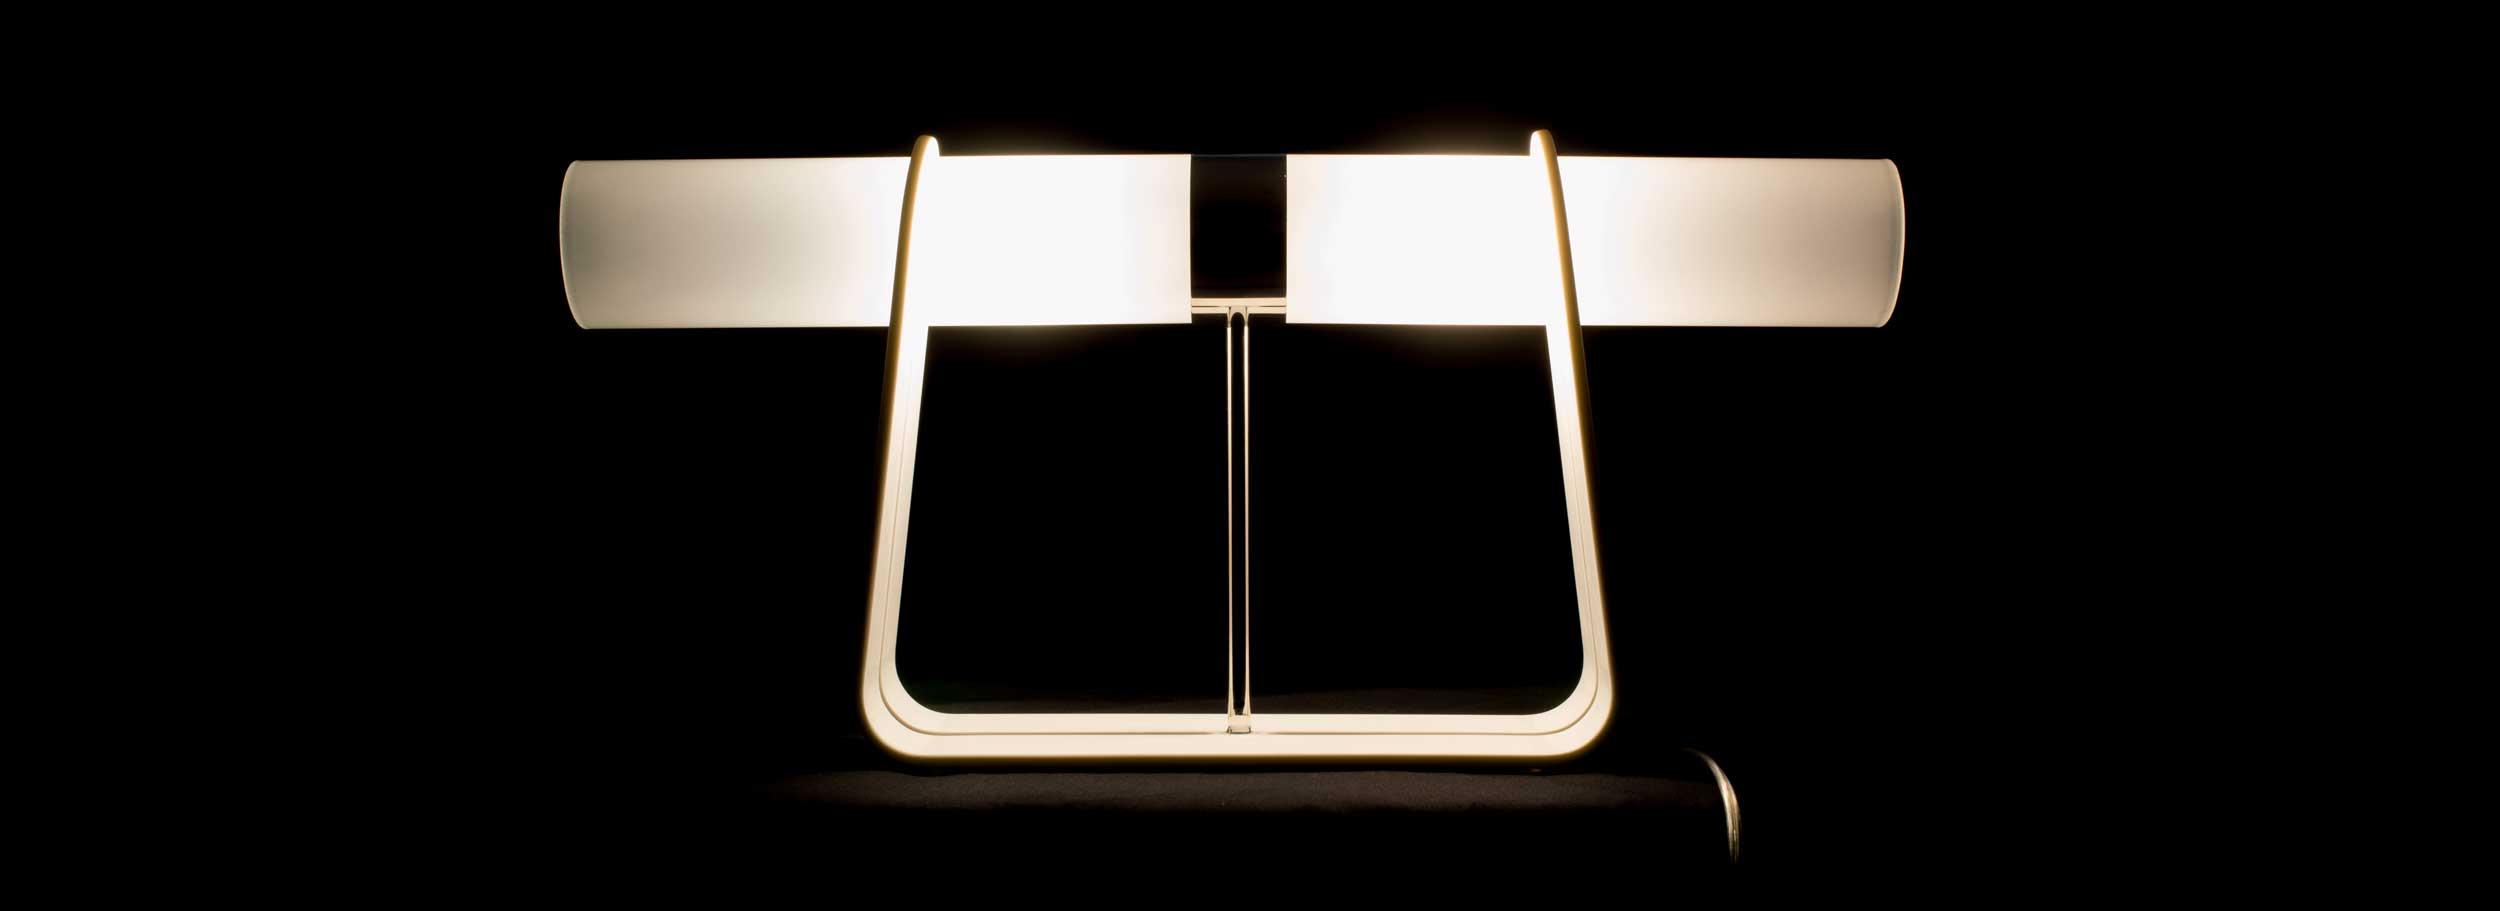 Lampe-3_14